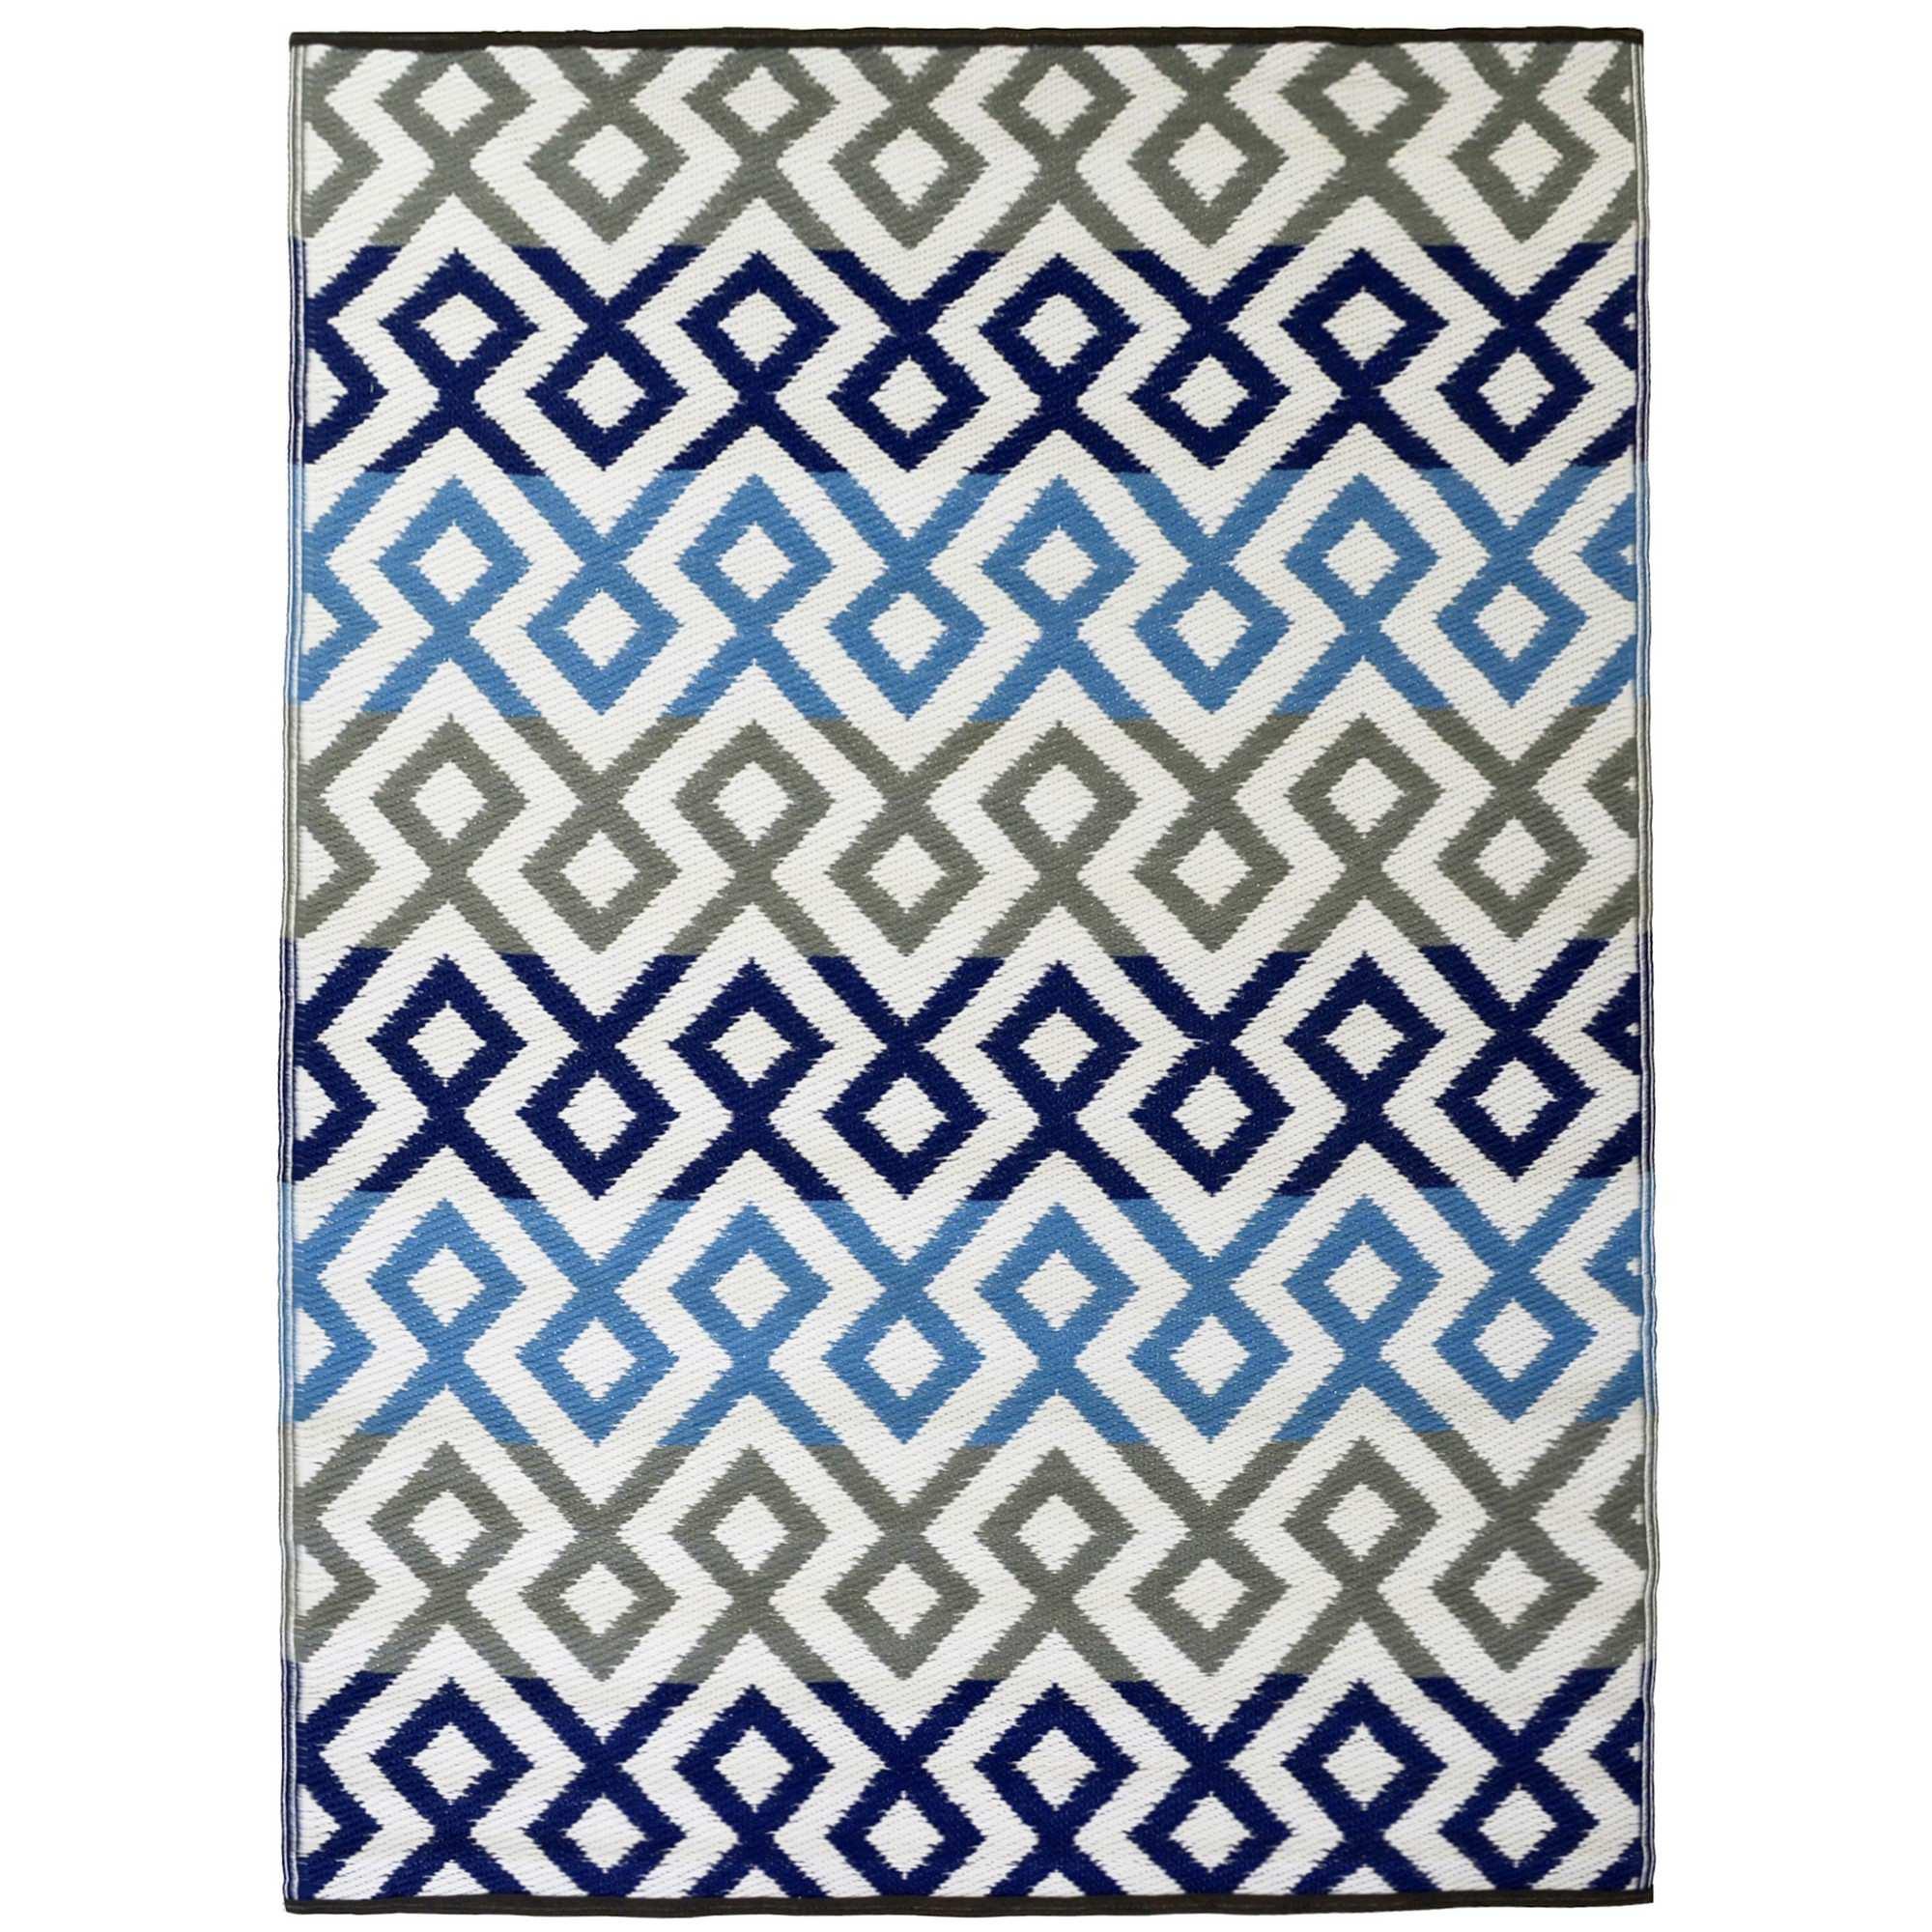 Chatai Geo Diamond Reversible Indoor/Outdoor Rug, 180x270cm, Blue/Grey